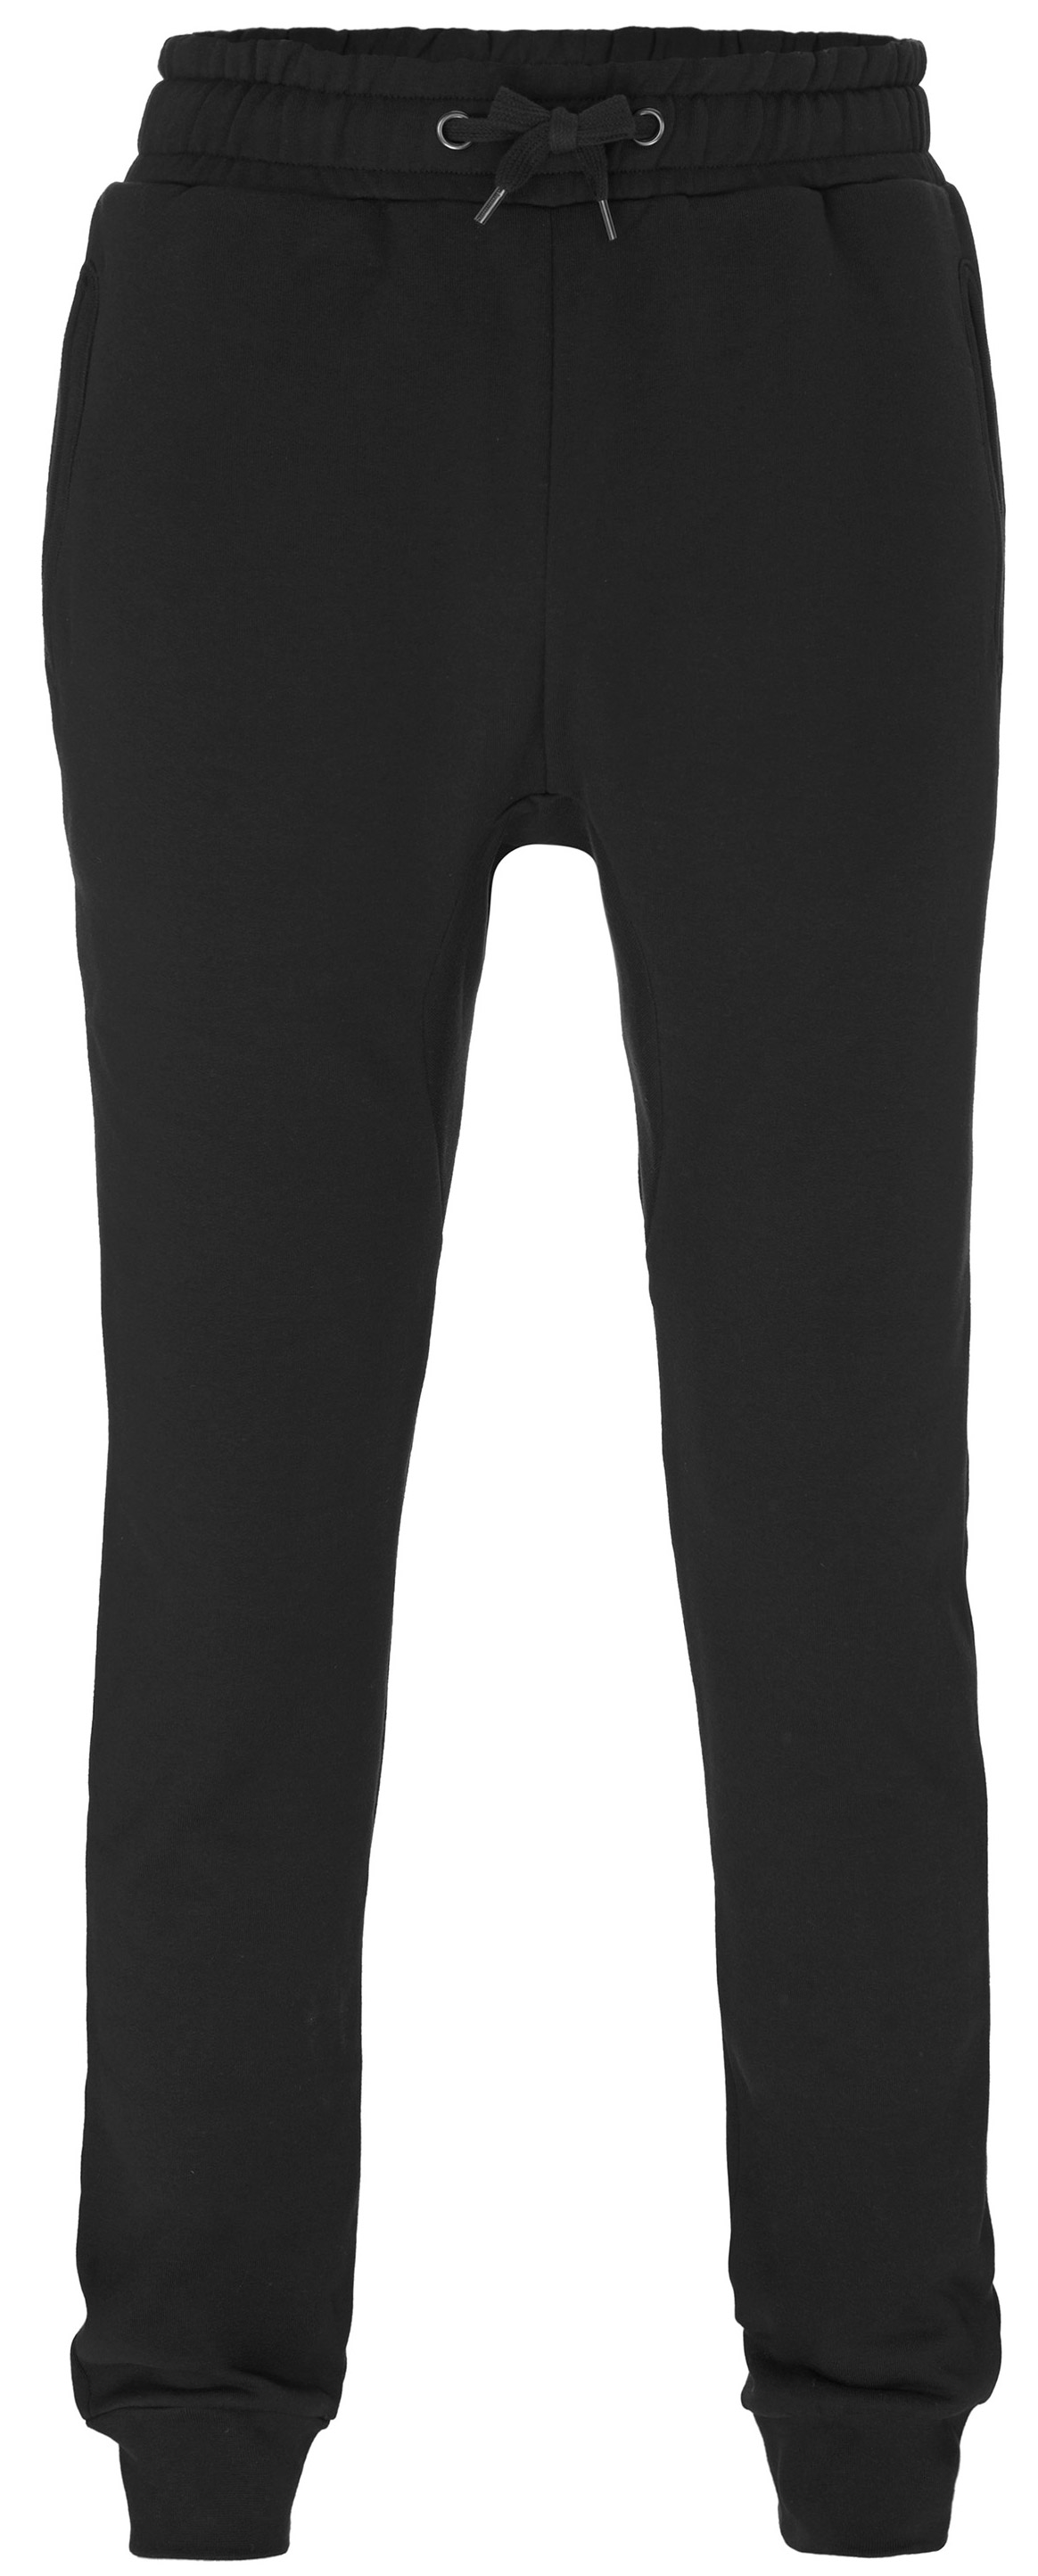 fbca8e8ac92e Fair Trade Jeans, Chinos   Jogginghosen aus Bio-Baumwolle   grundstoff.net